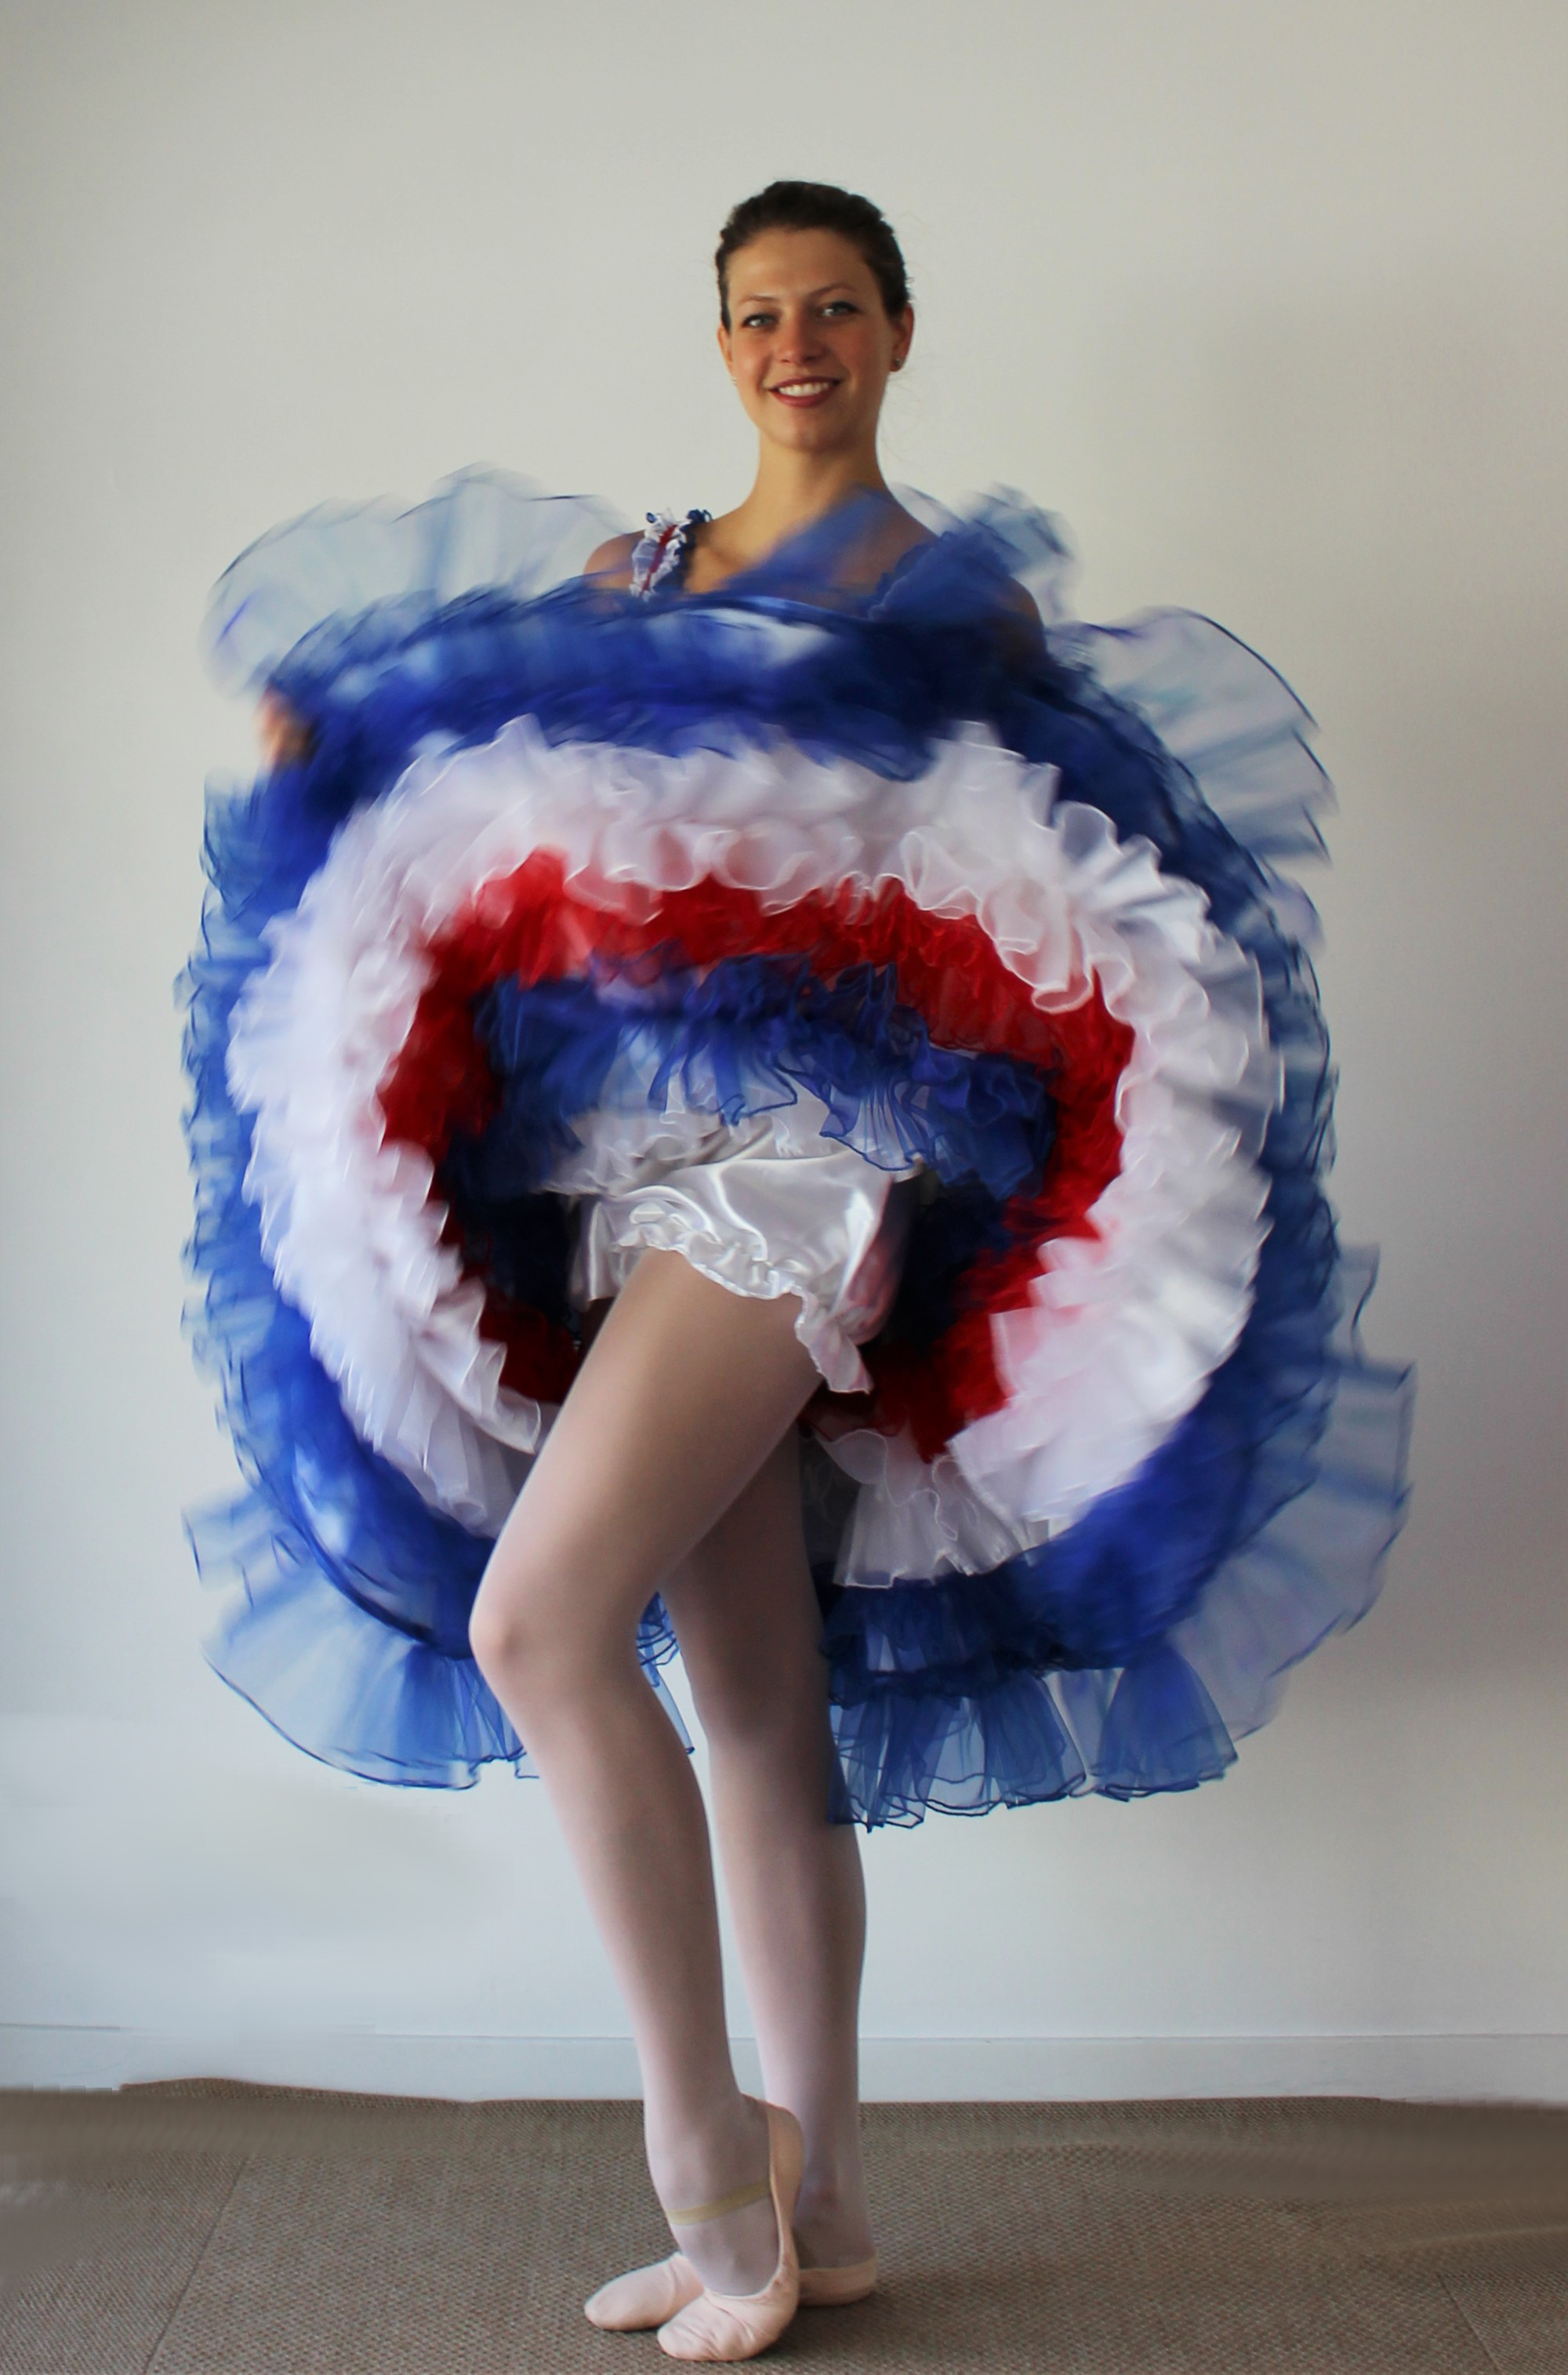 www.adc,danse.com/location,costume,danse,french,cancan